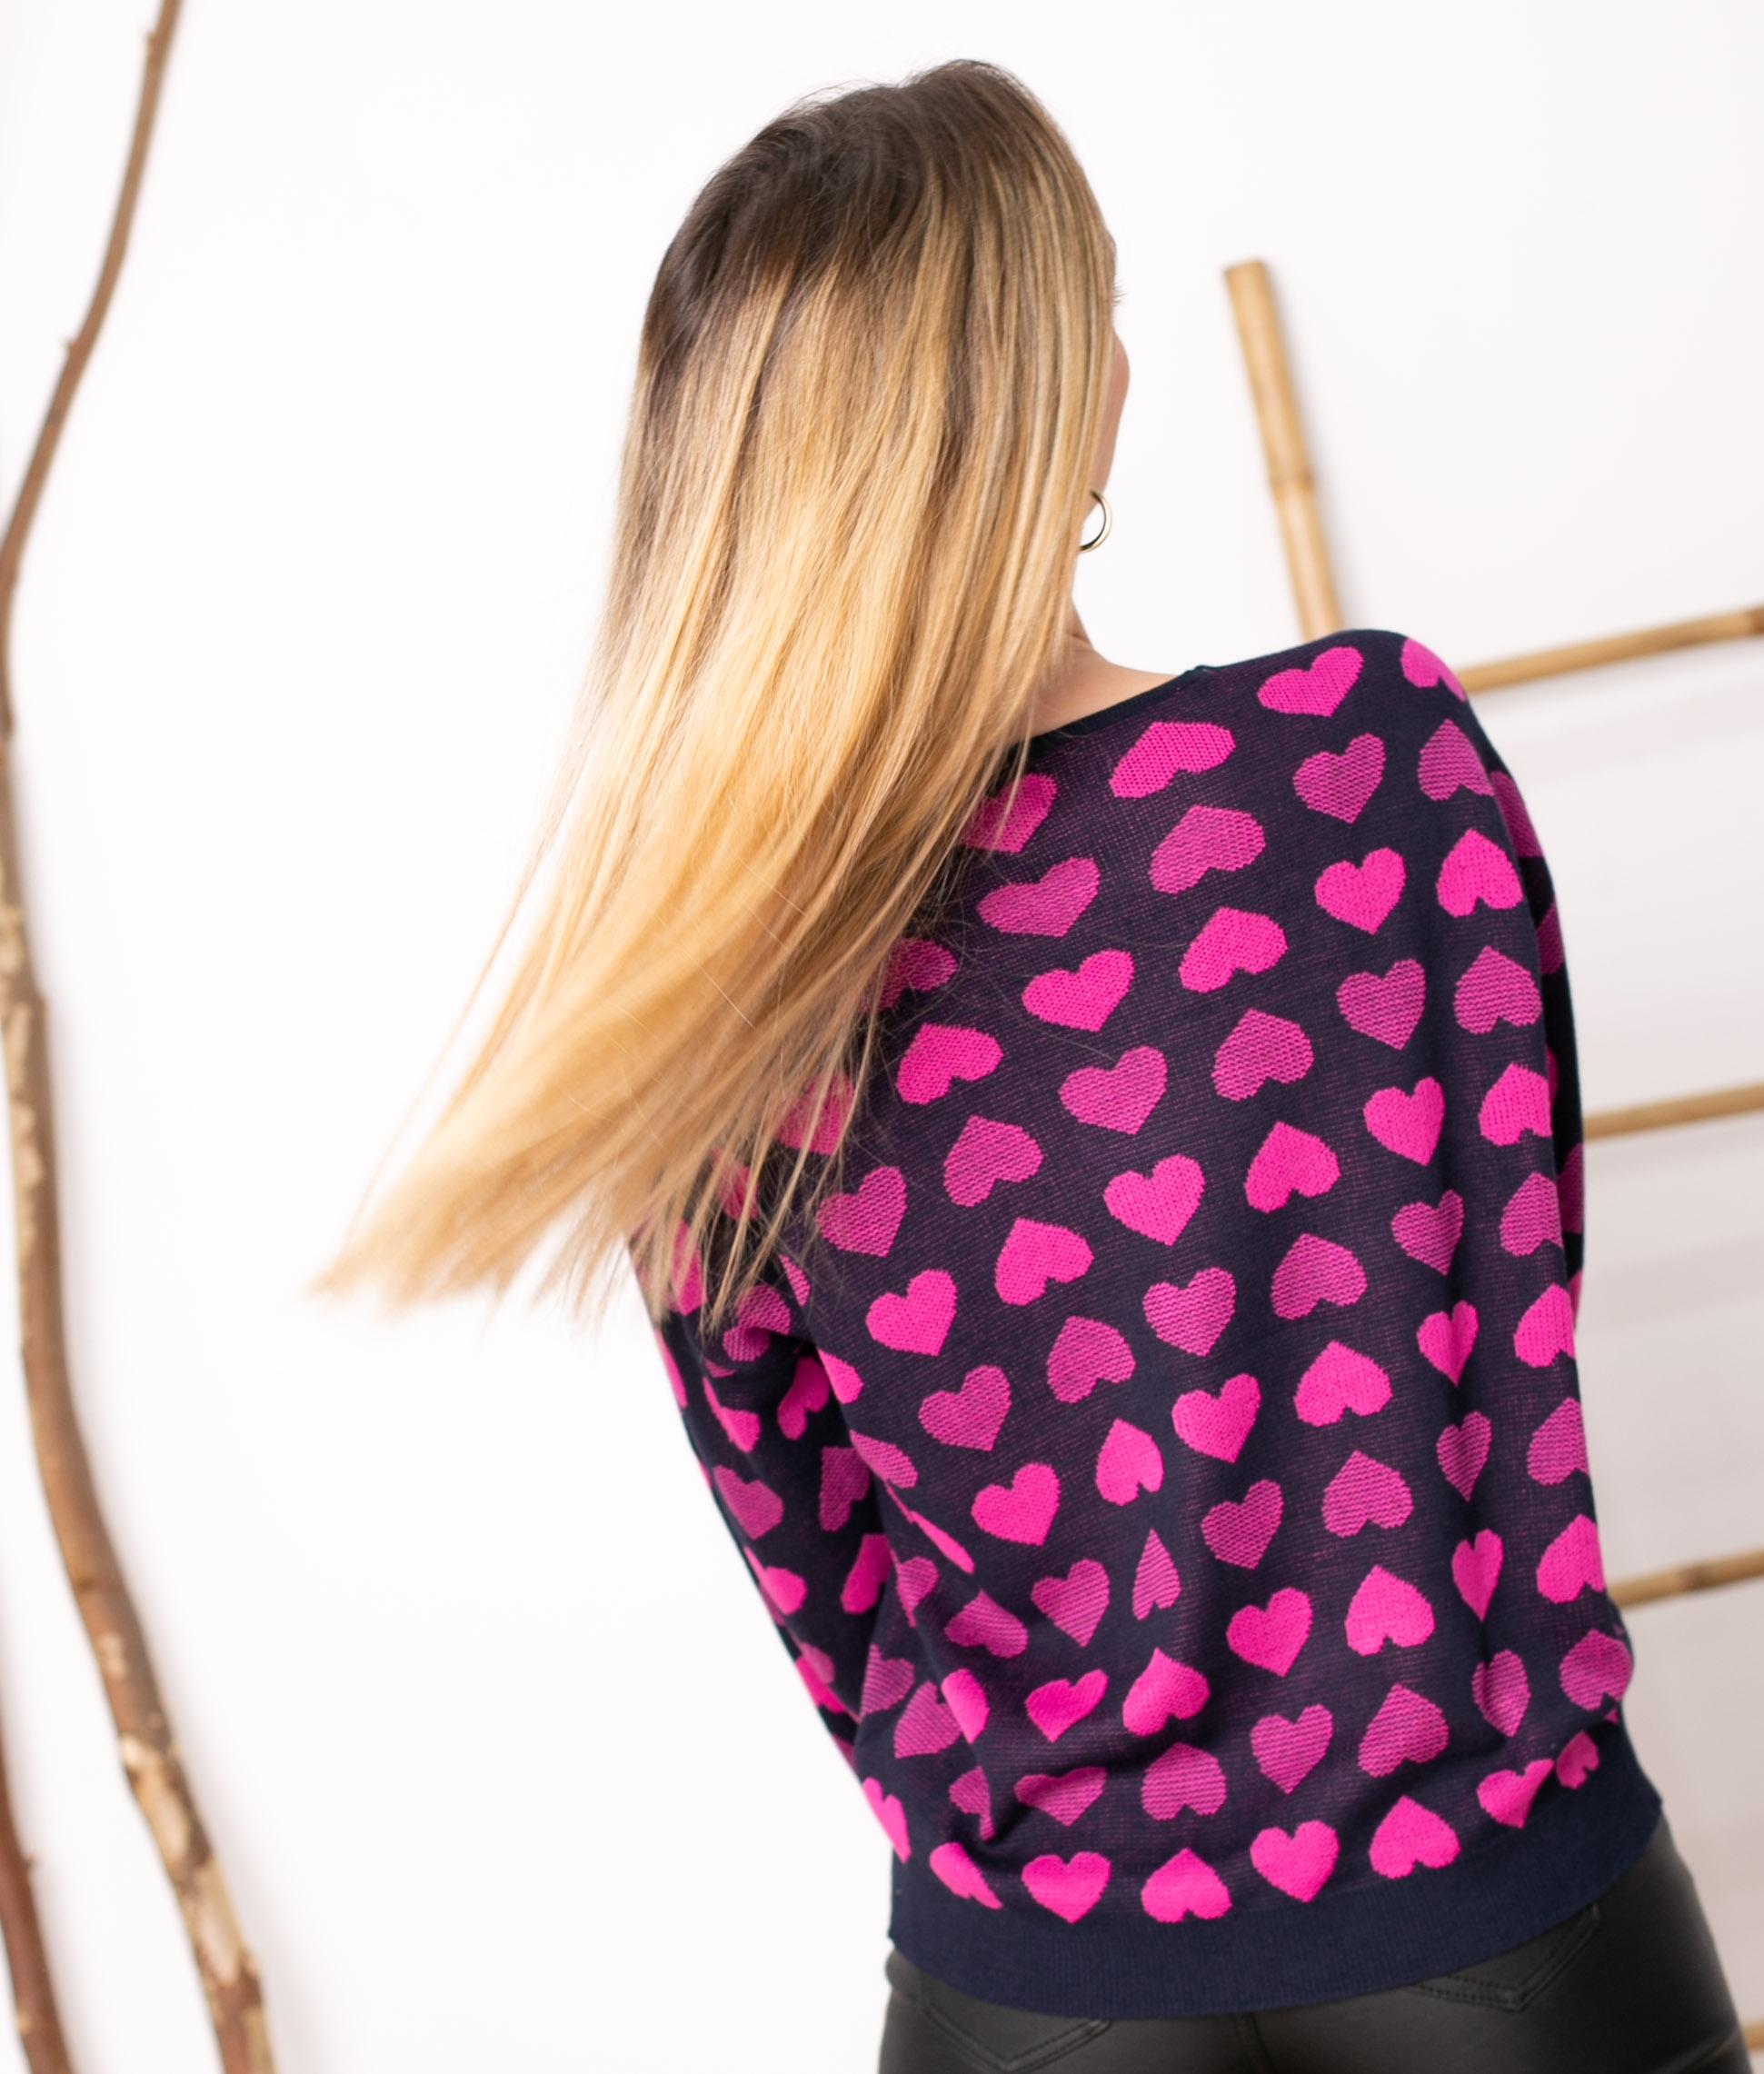 Sweater Bailos - Black